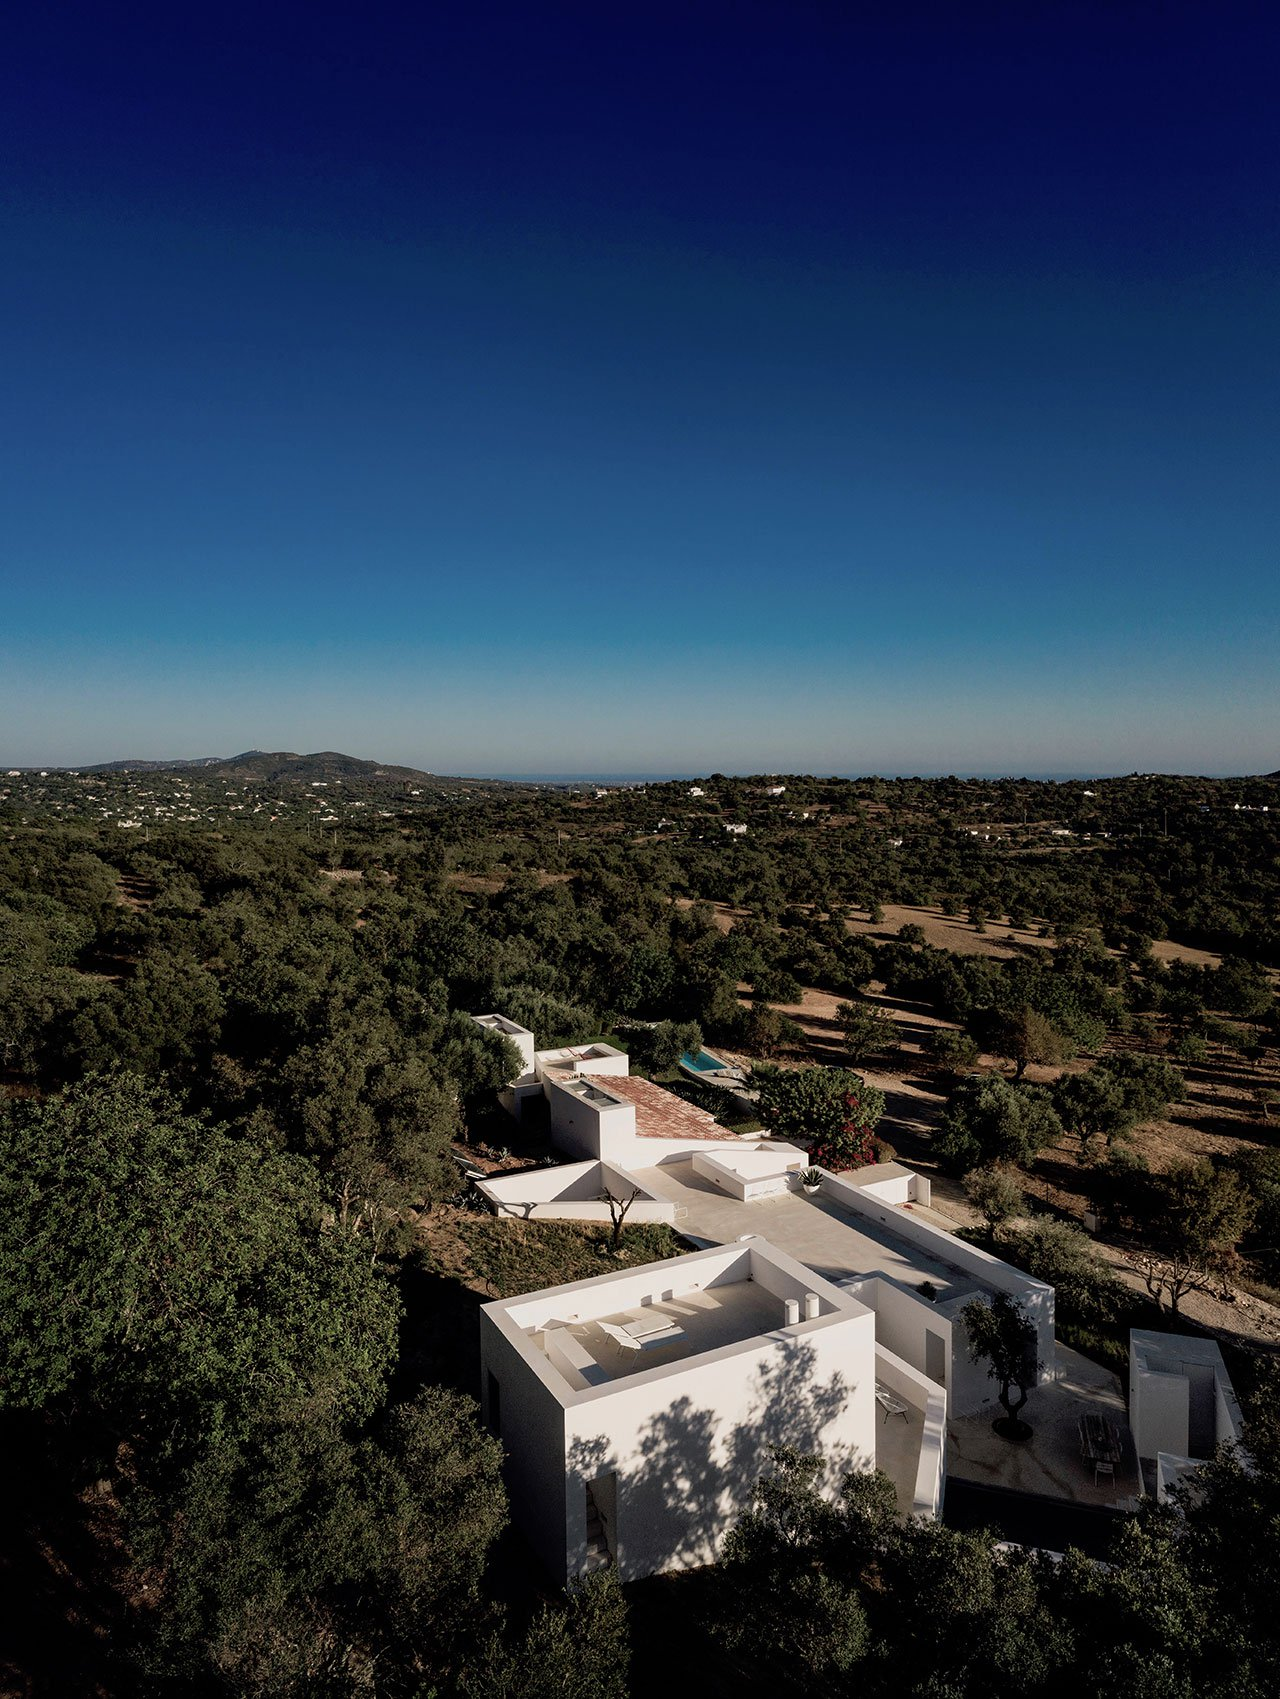 casa-luum-minimalizmus-a-portugal-videken-noko-030.jpg